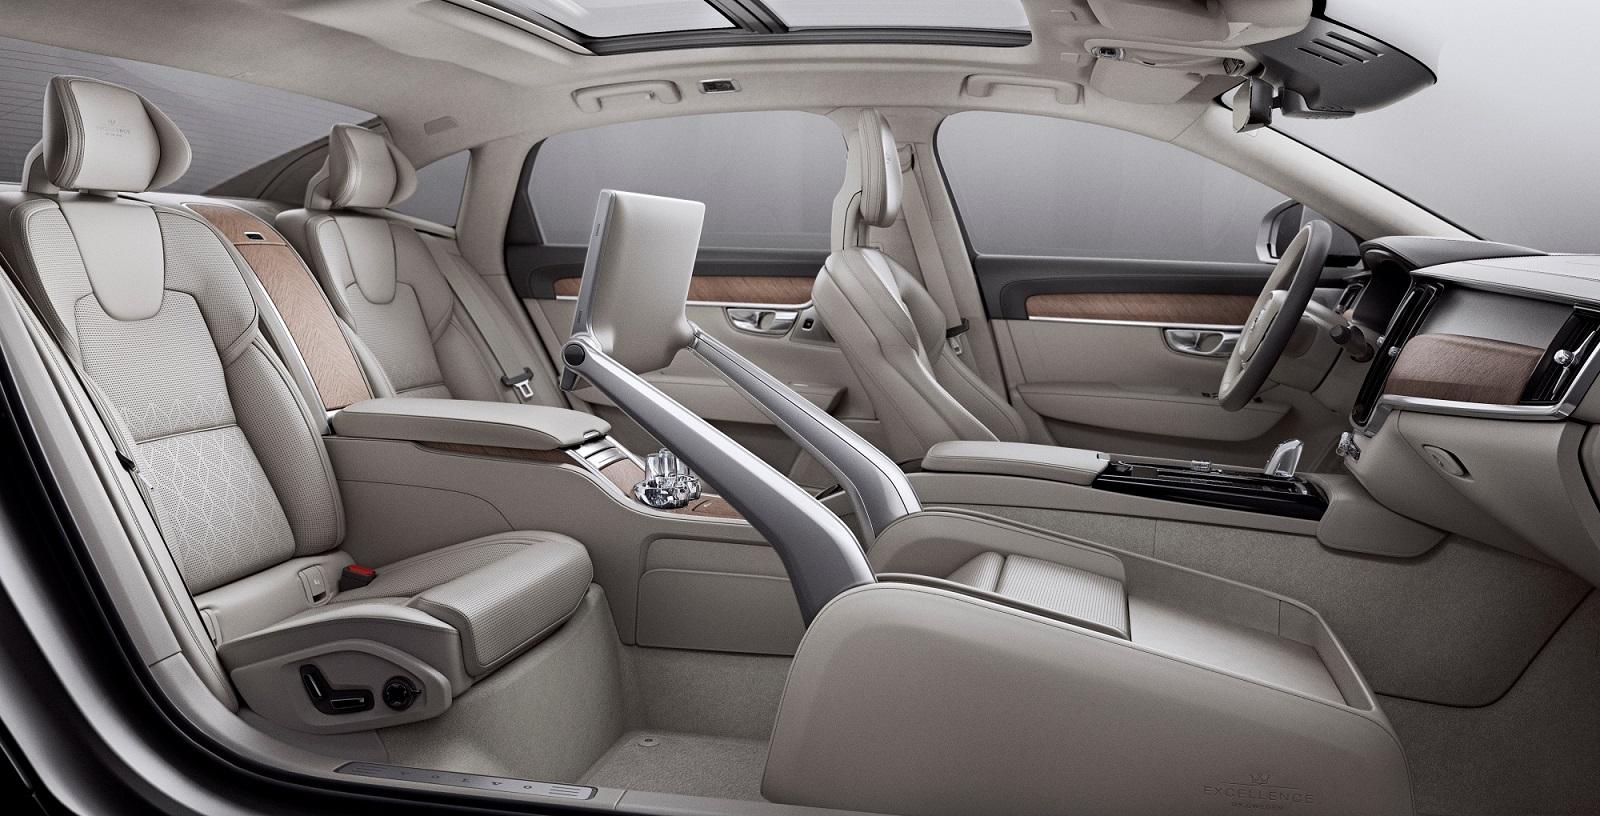 VOLVO2BS902BEXCELLENCE INTERIOR2B1 H Volvo αυξάνει την παραγωγή της και αλλάζει στρατηγική για τα εργοστάσιά της σε Ευρώπη, Κίνα, ΗΠΑ Volvo, Volvo Cars, Volvo S90, Volvo S90 Excellence, αγορά, Τεχνολογία